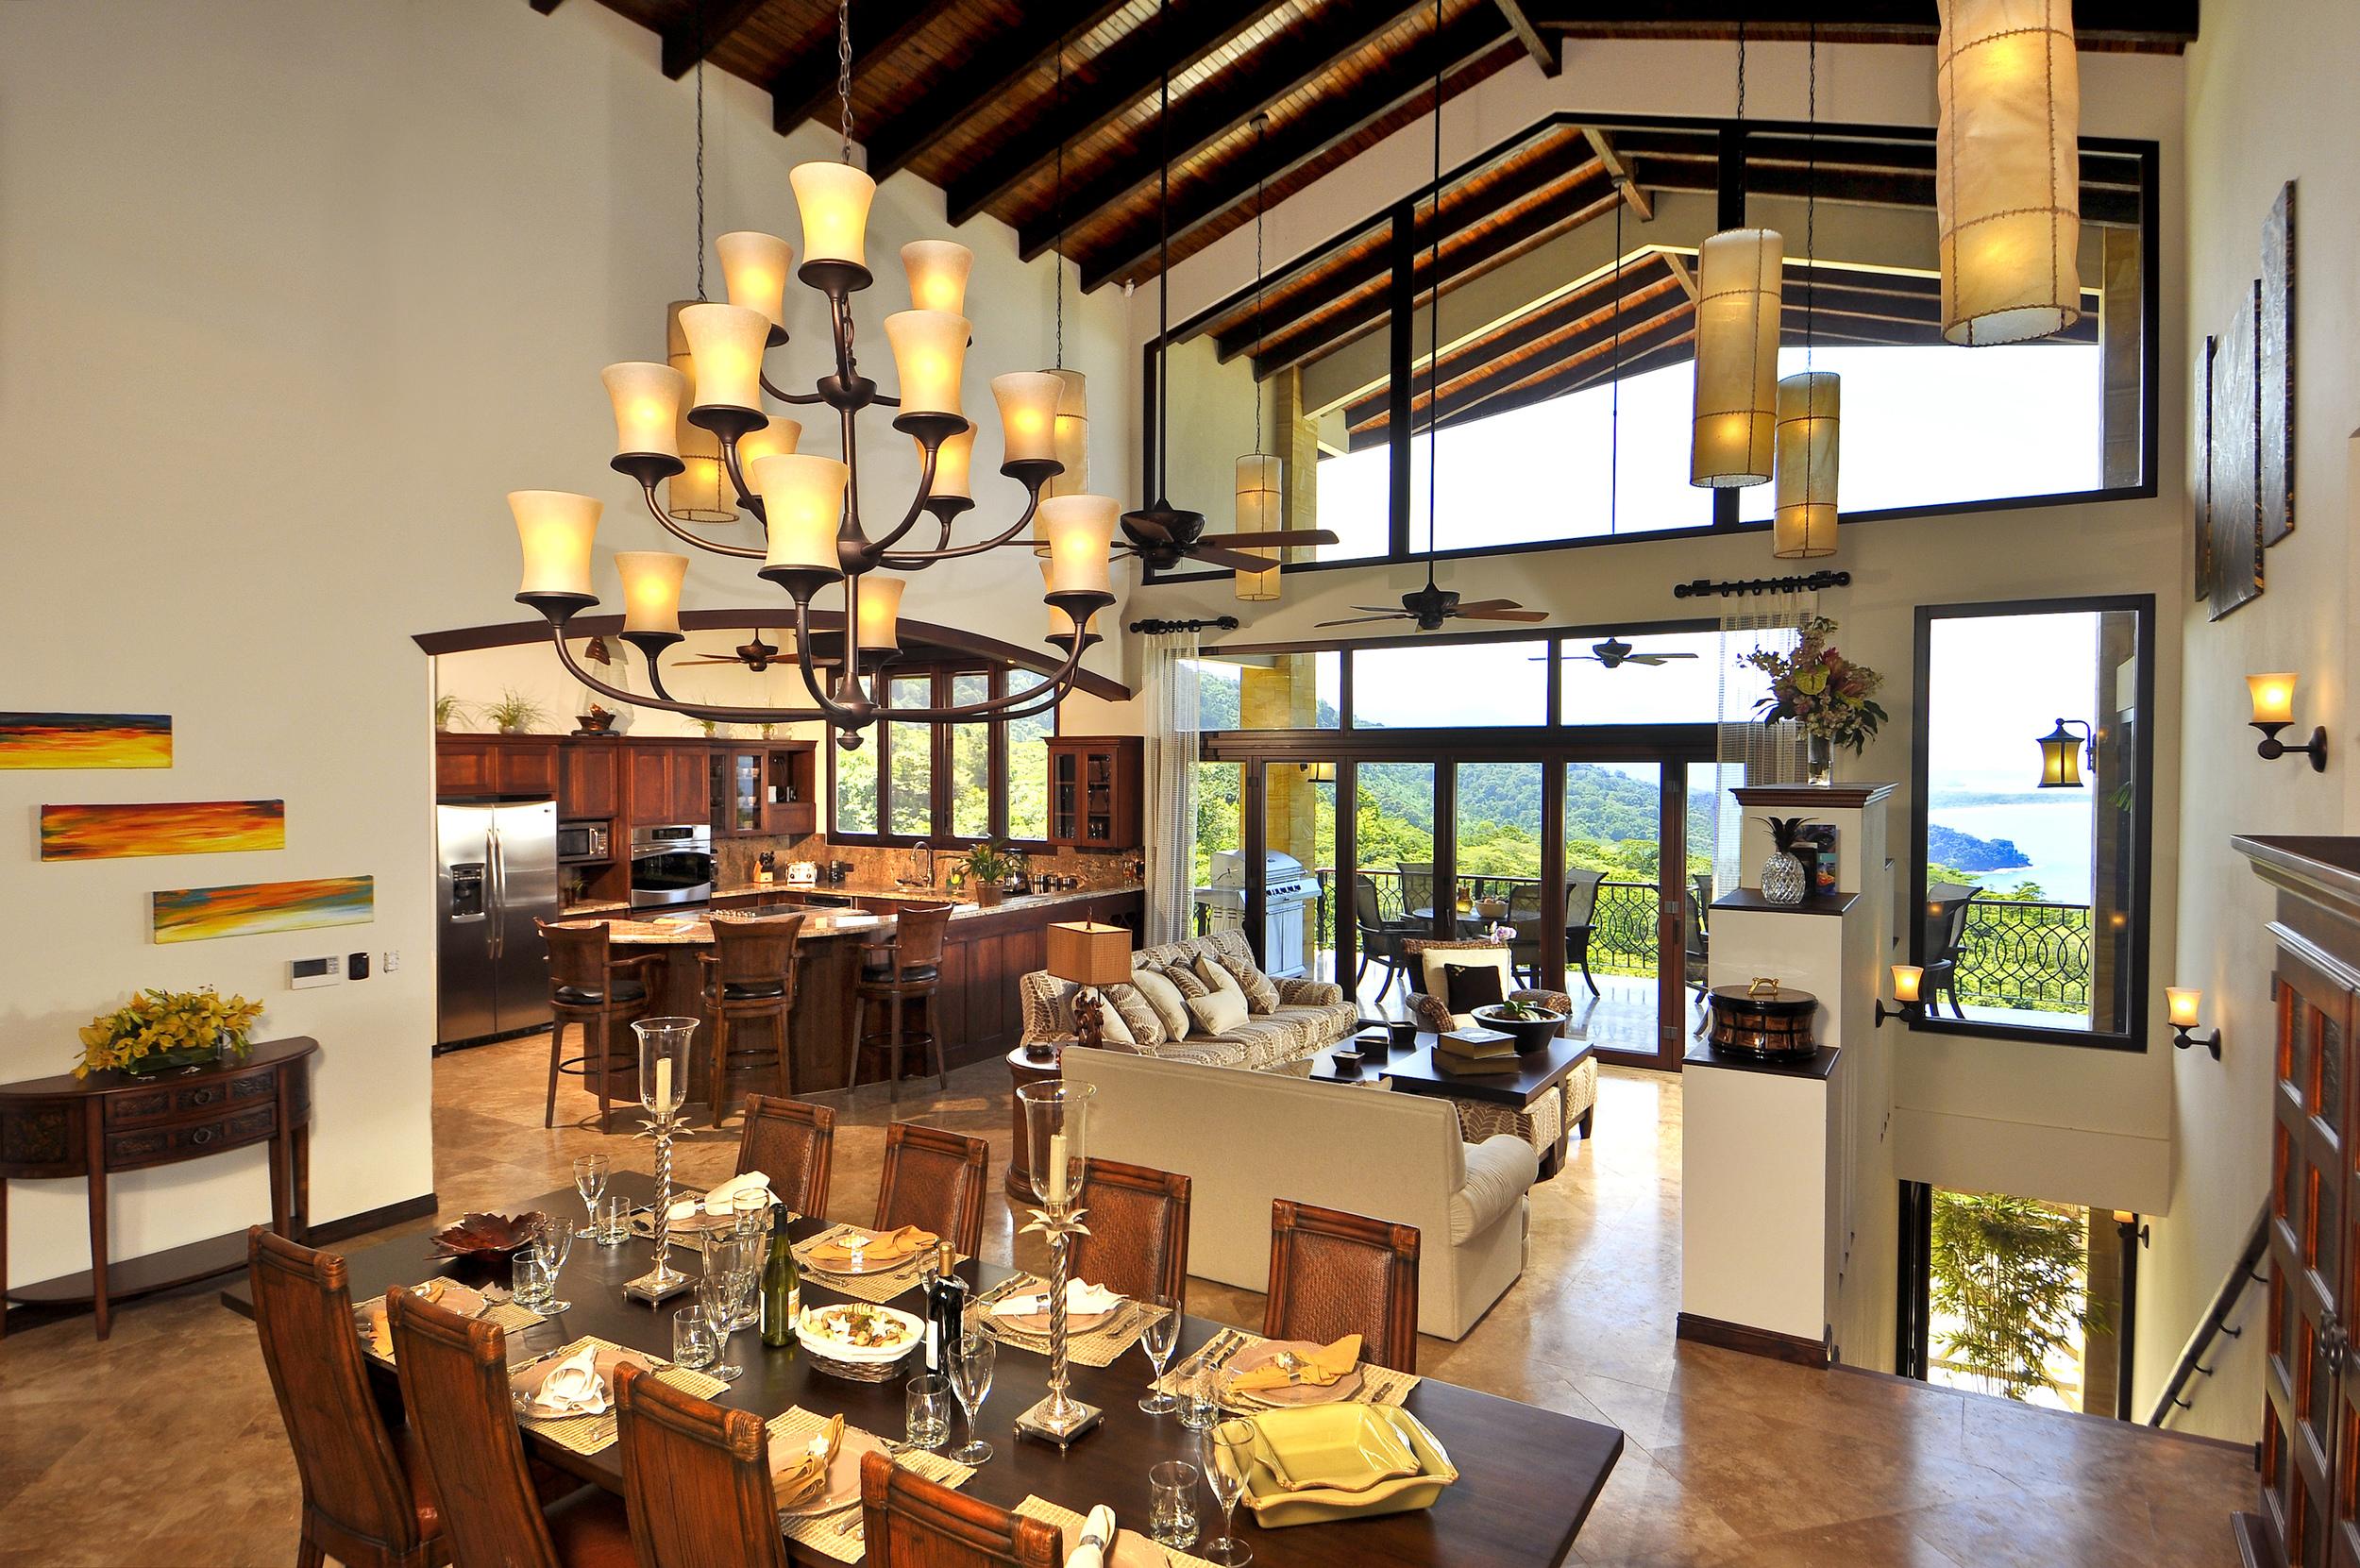 flex5-yoga-retreat-costa-rica-dining-room-ocean-view.jpg